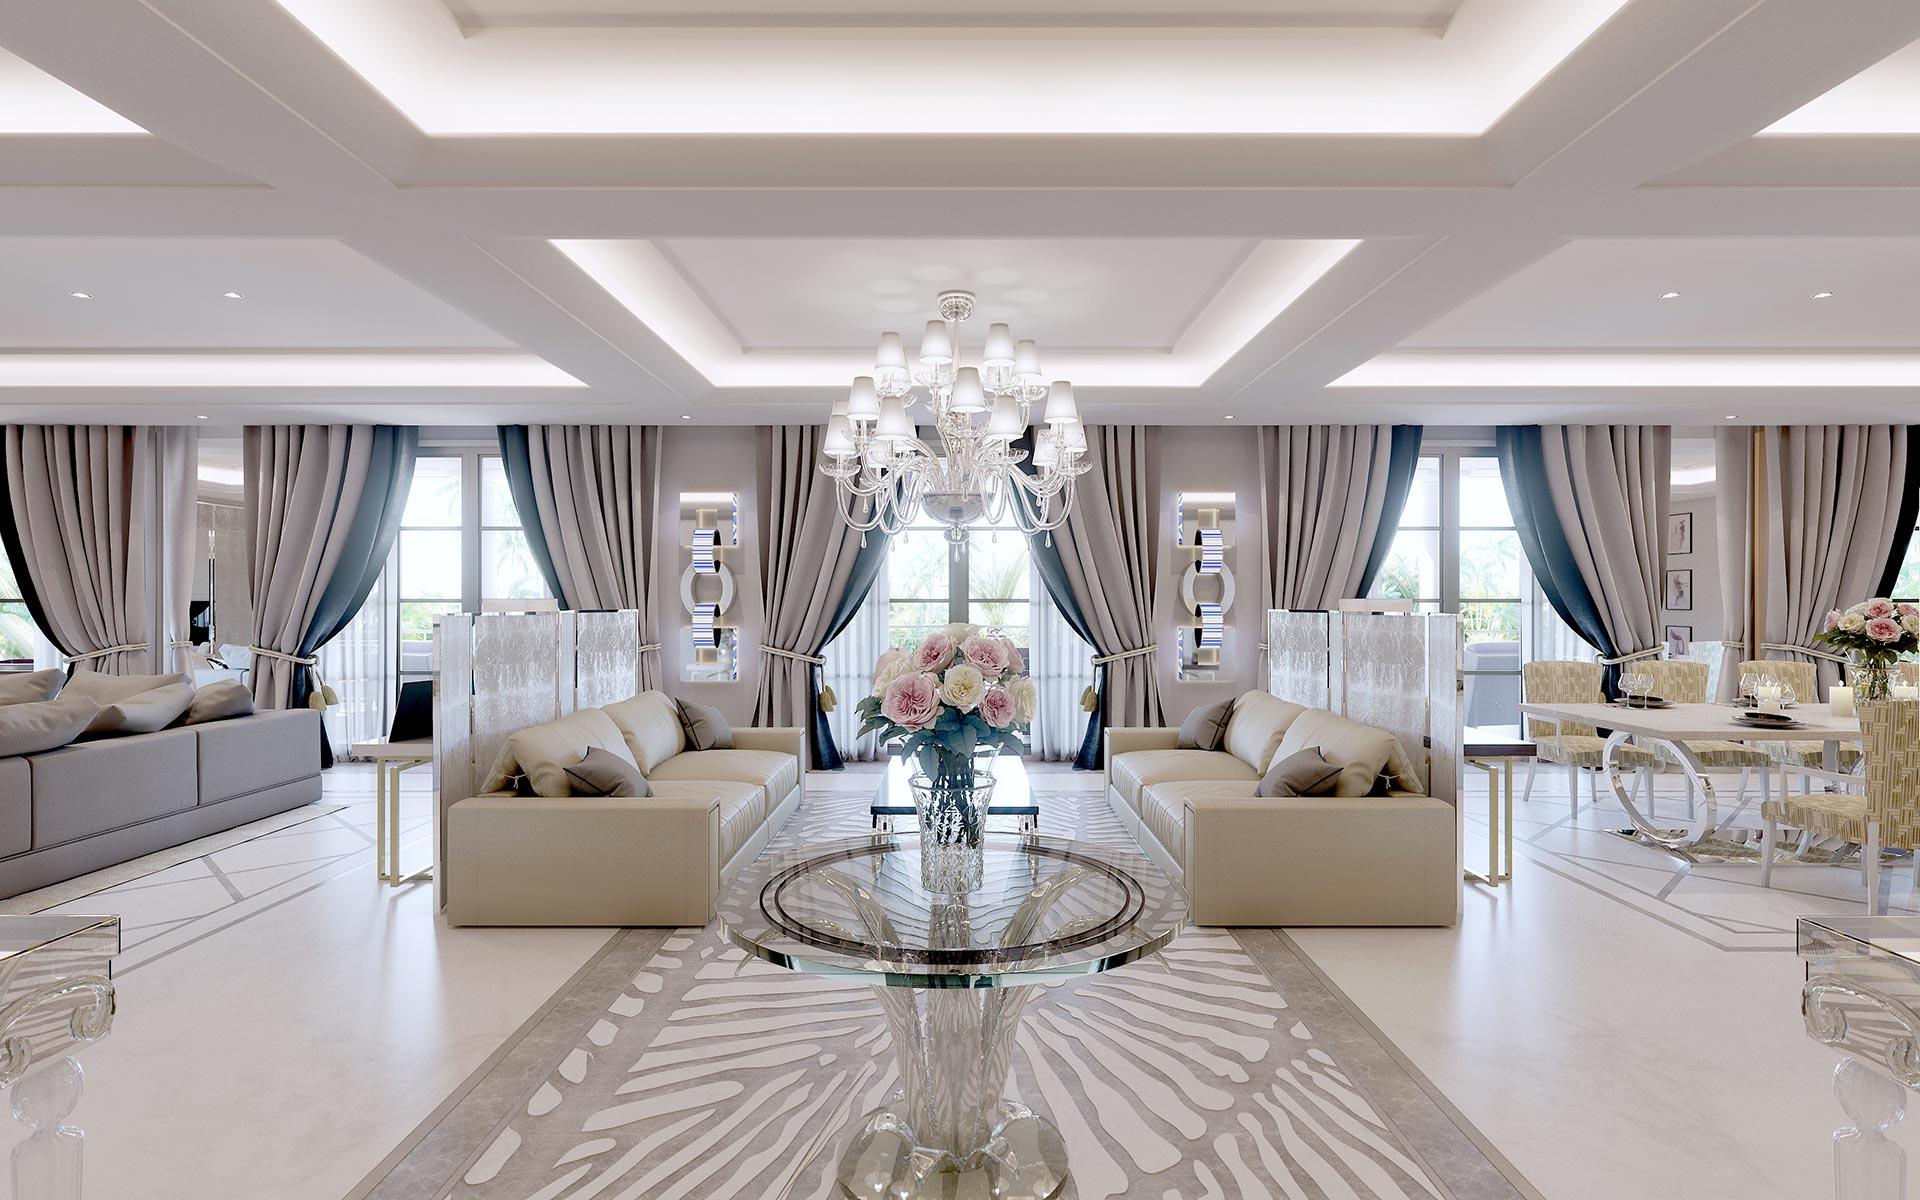 3D View of a luxury villa interior